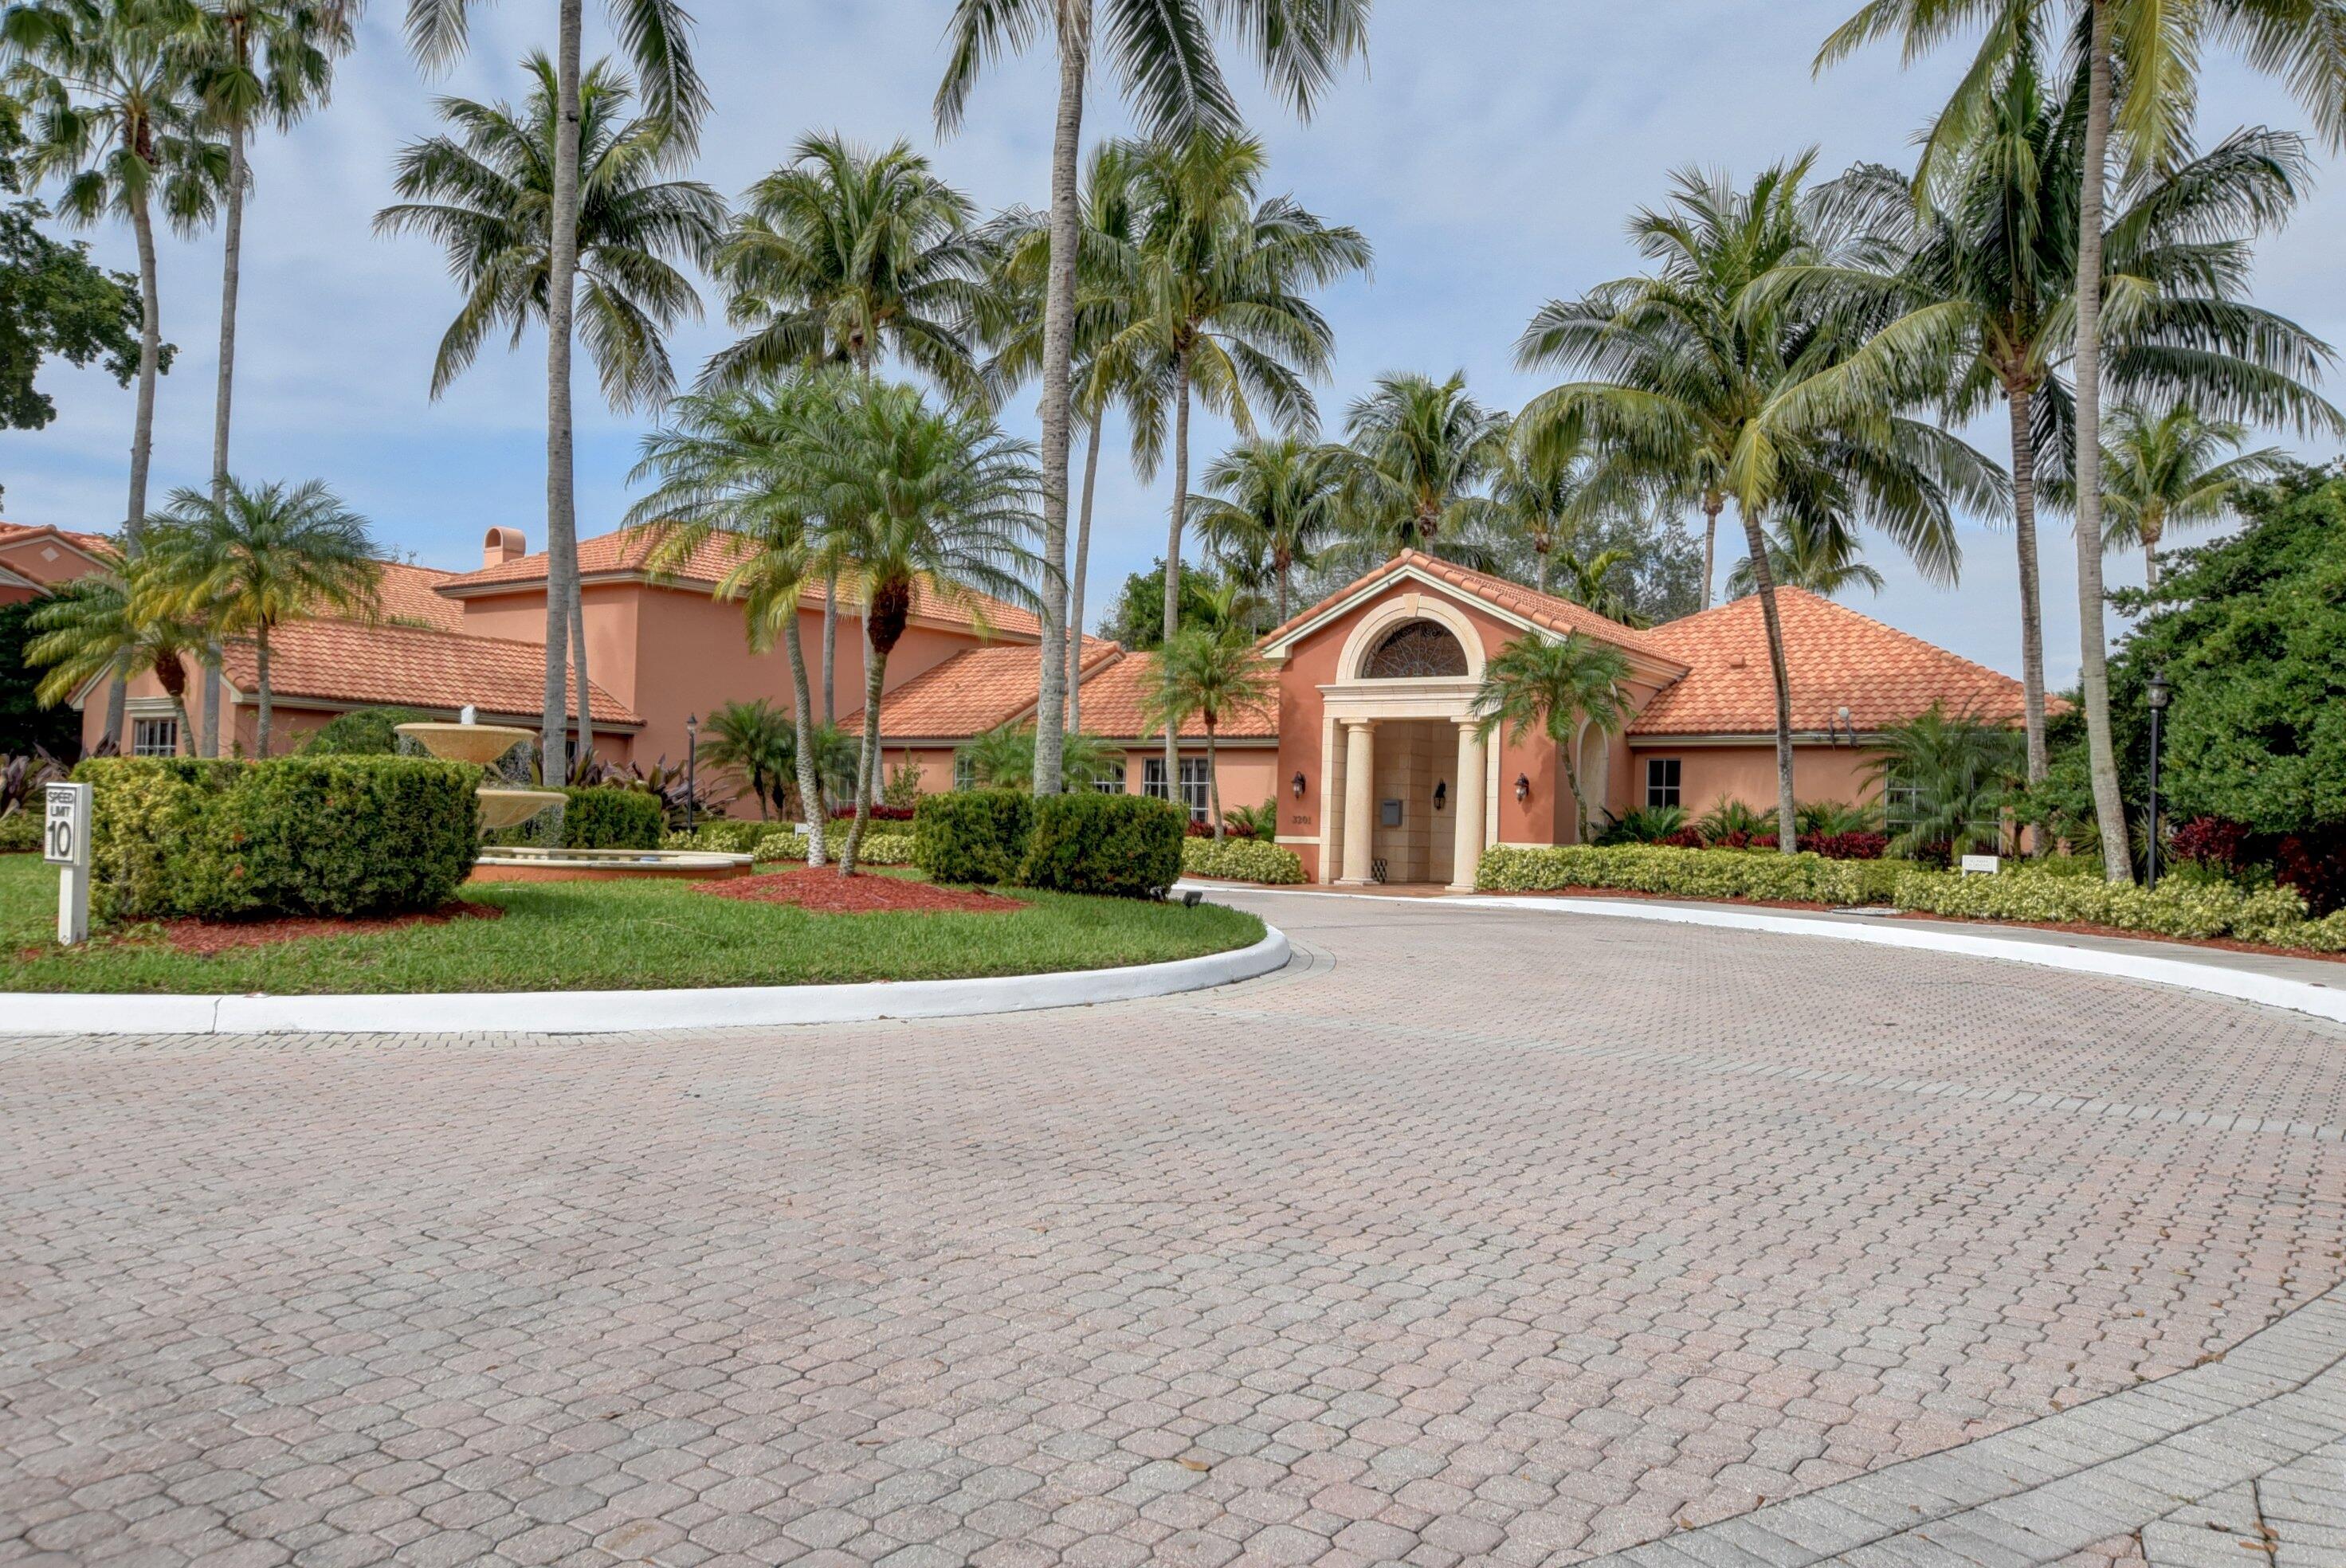 Home for sale in Bocar Condominums Boca Raton Florida